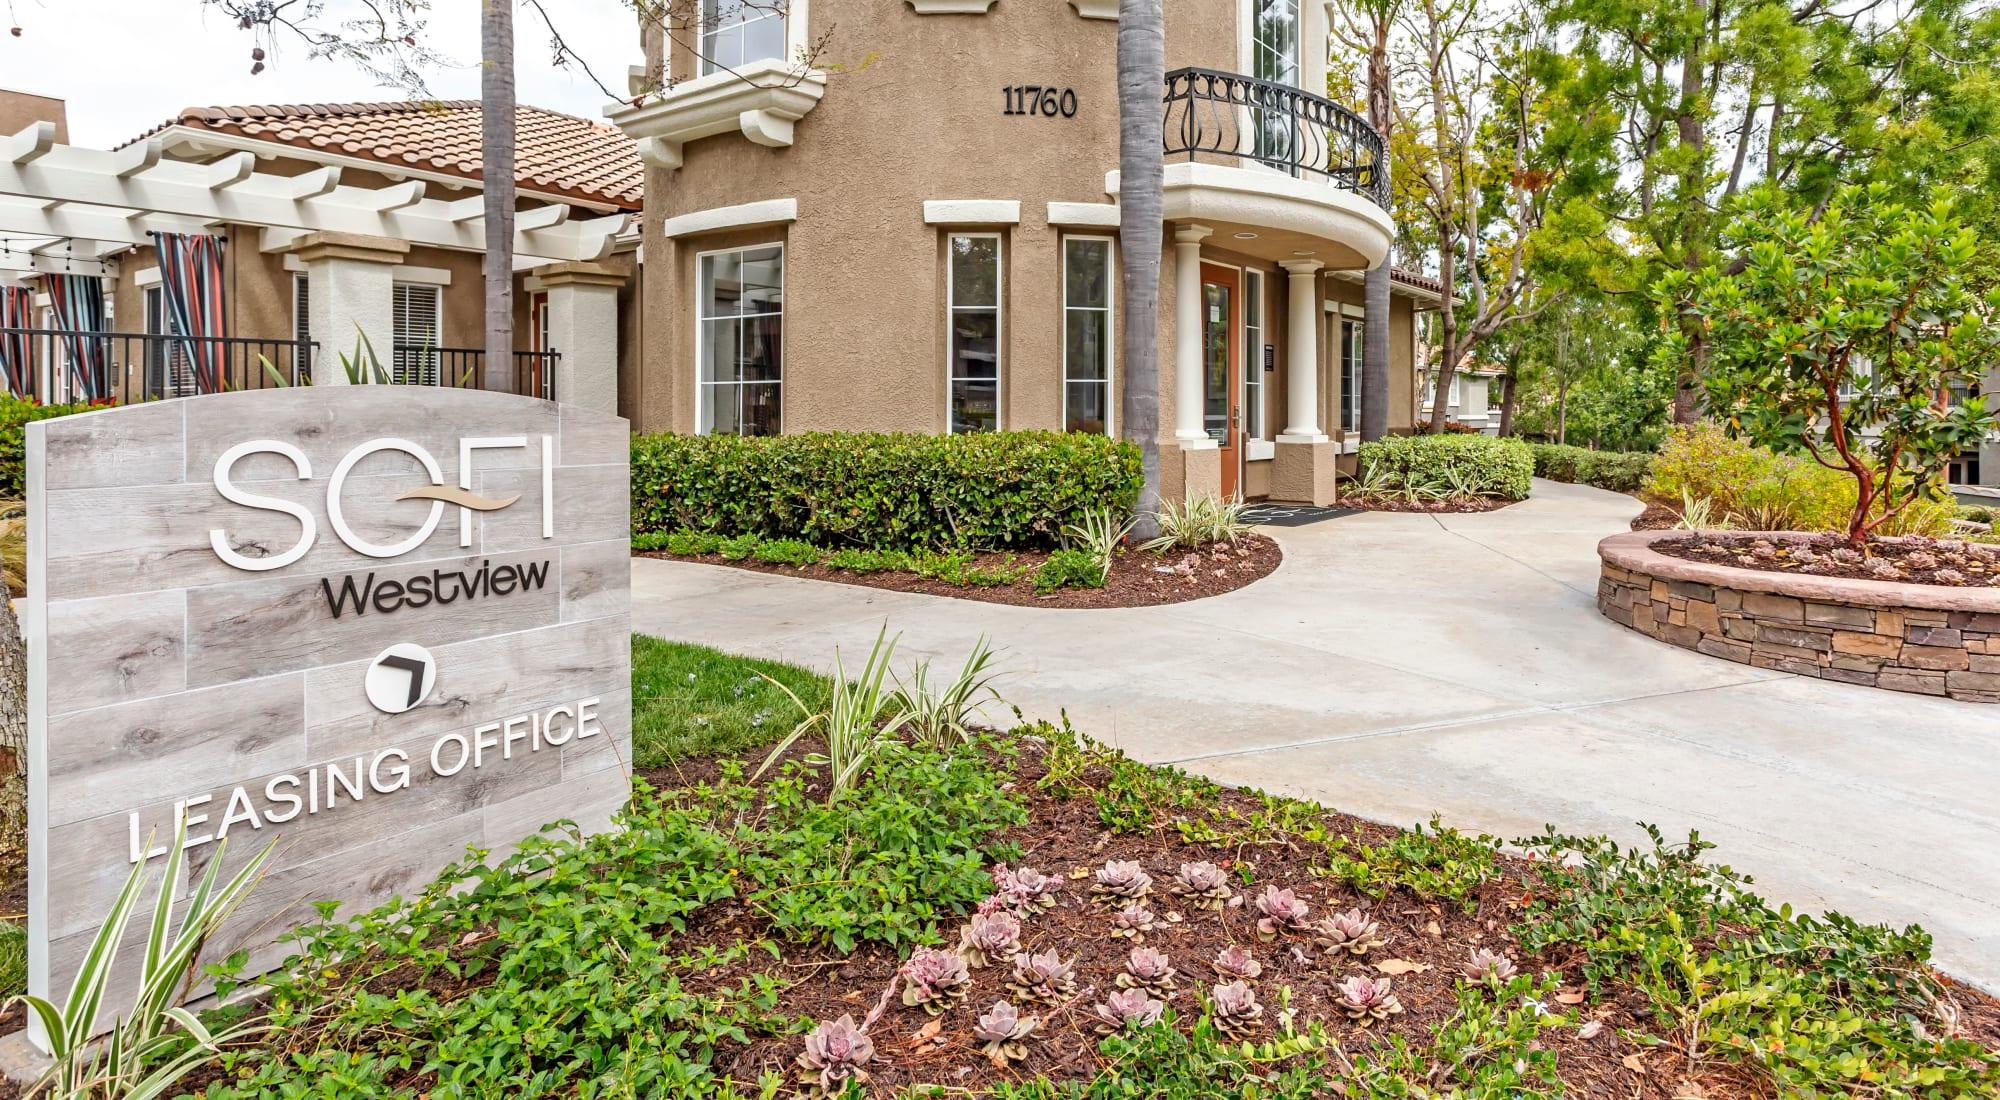 Pet-friendly apartments at Sofi Westview in San Diego, California